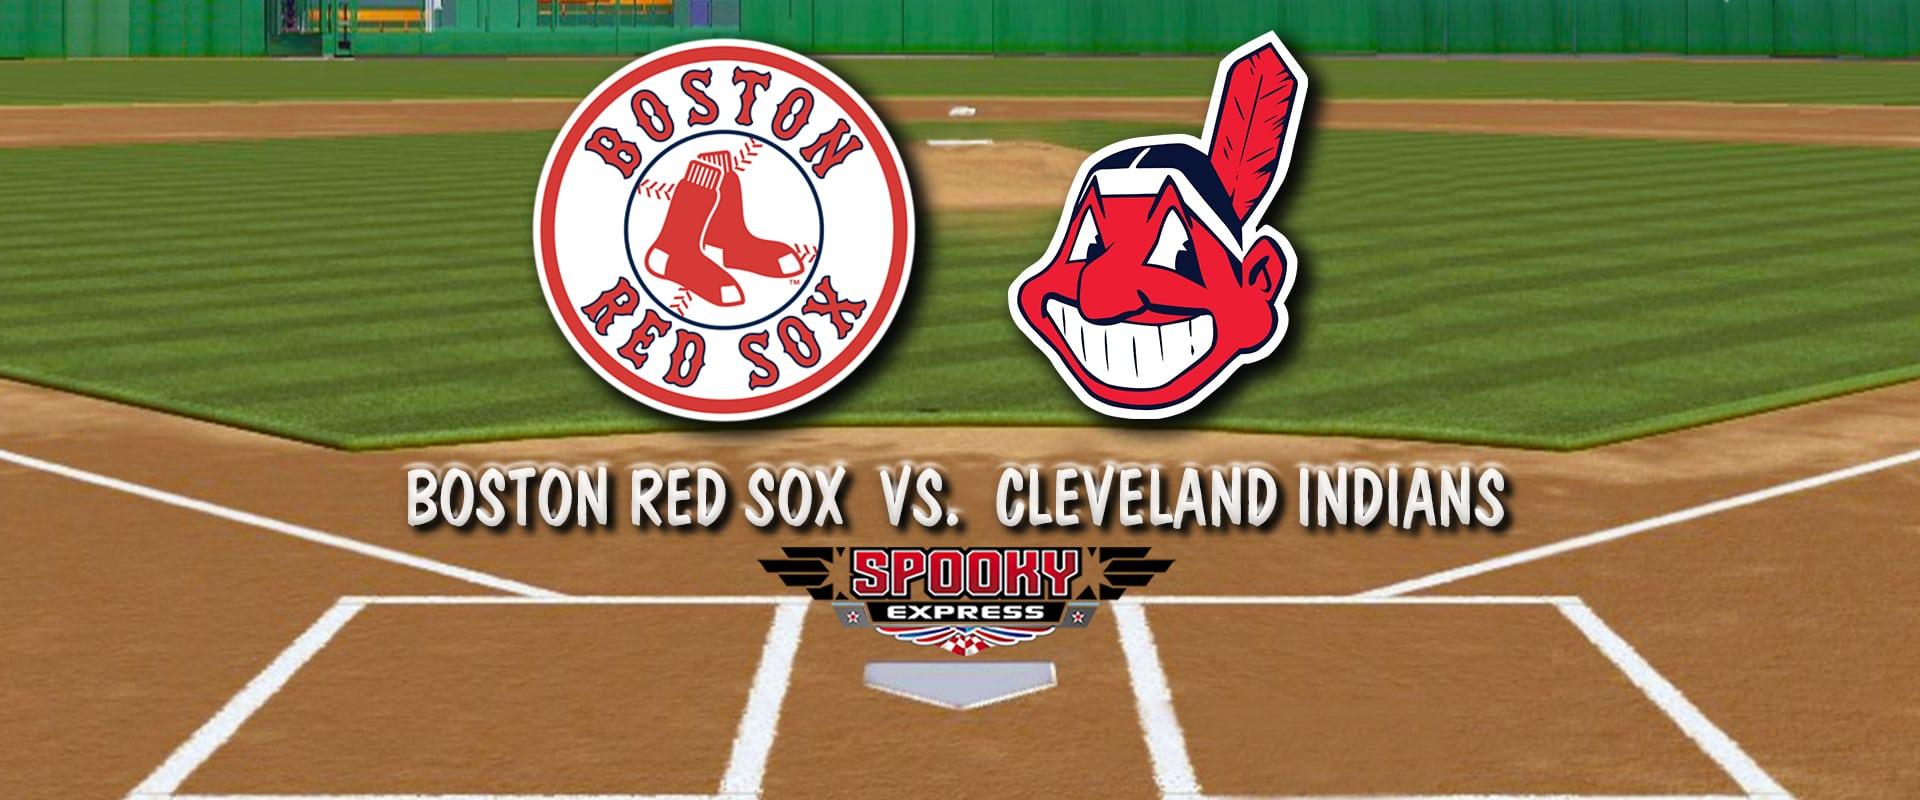 boston vs cleveland baseball game